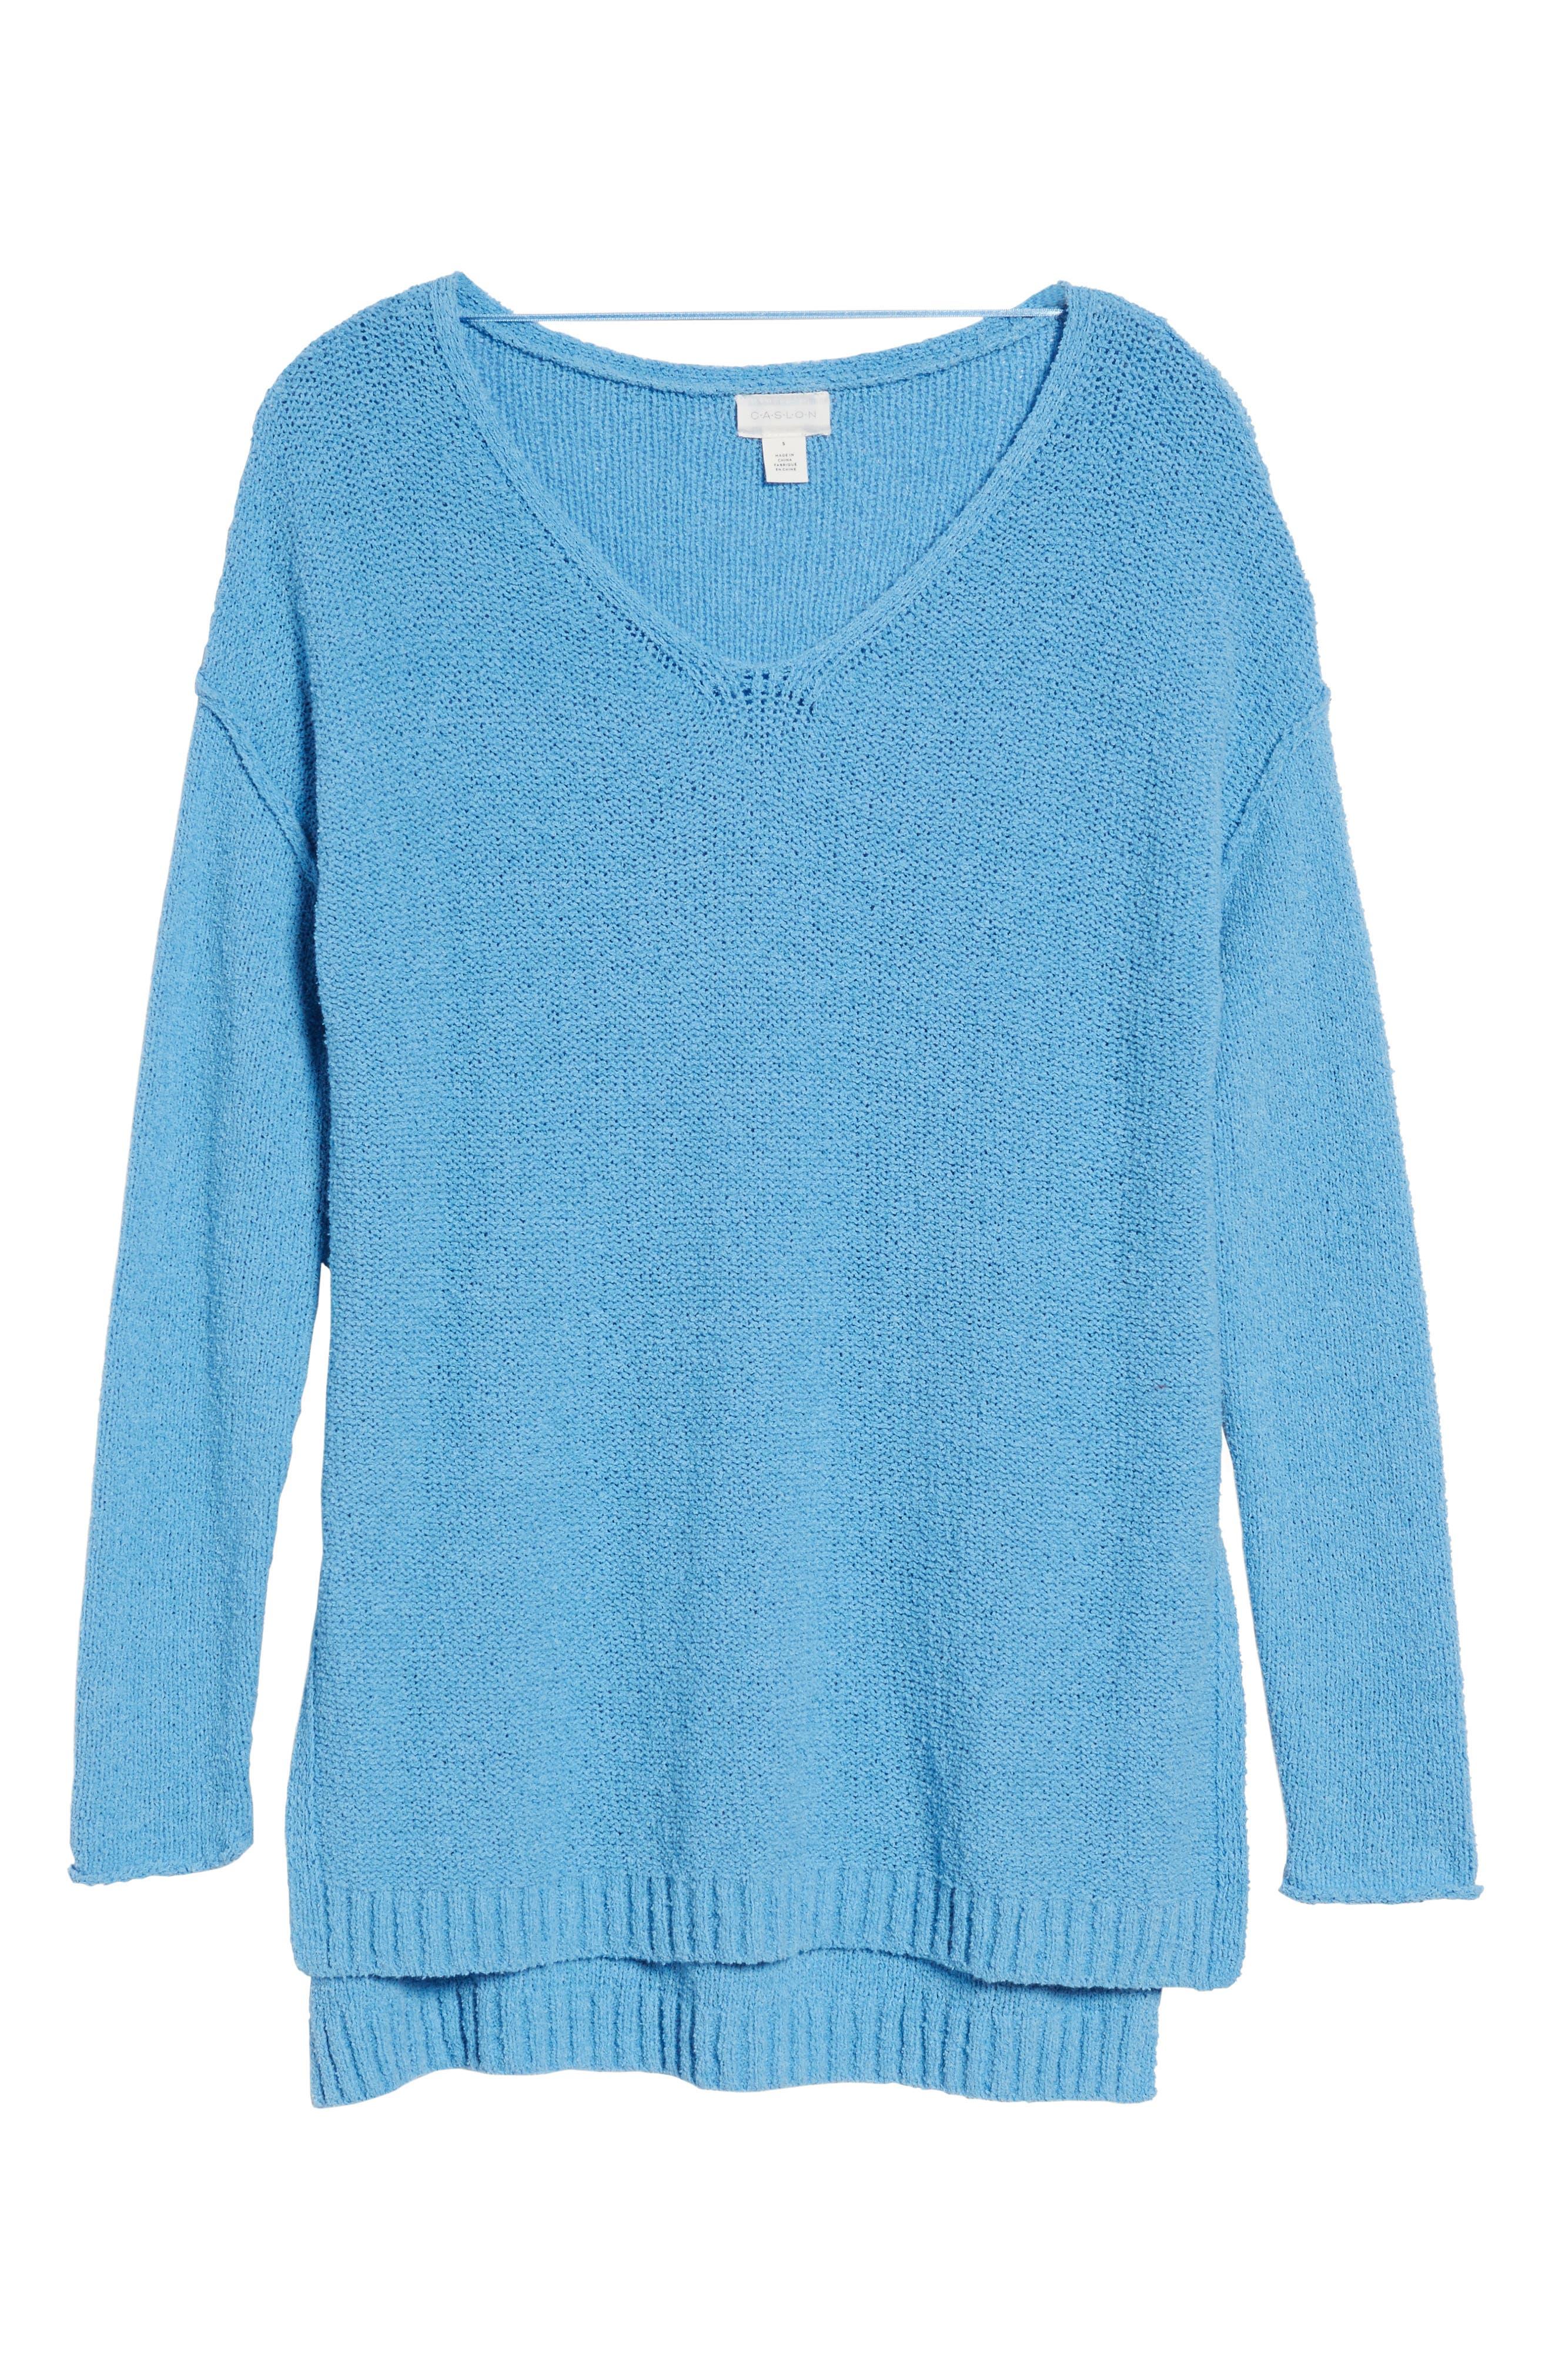 Tunic Sweater,                             Alternate thumbnail 7, color,                             Blue Lichen